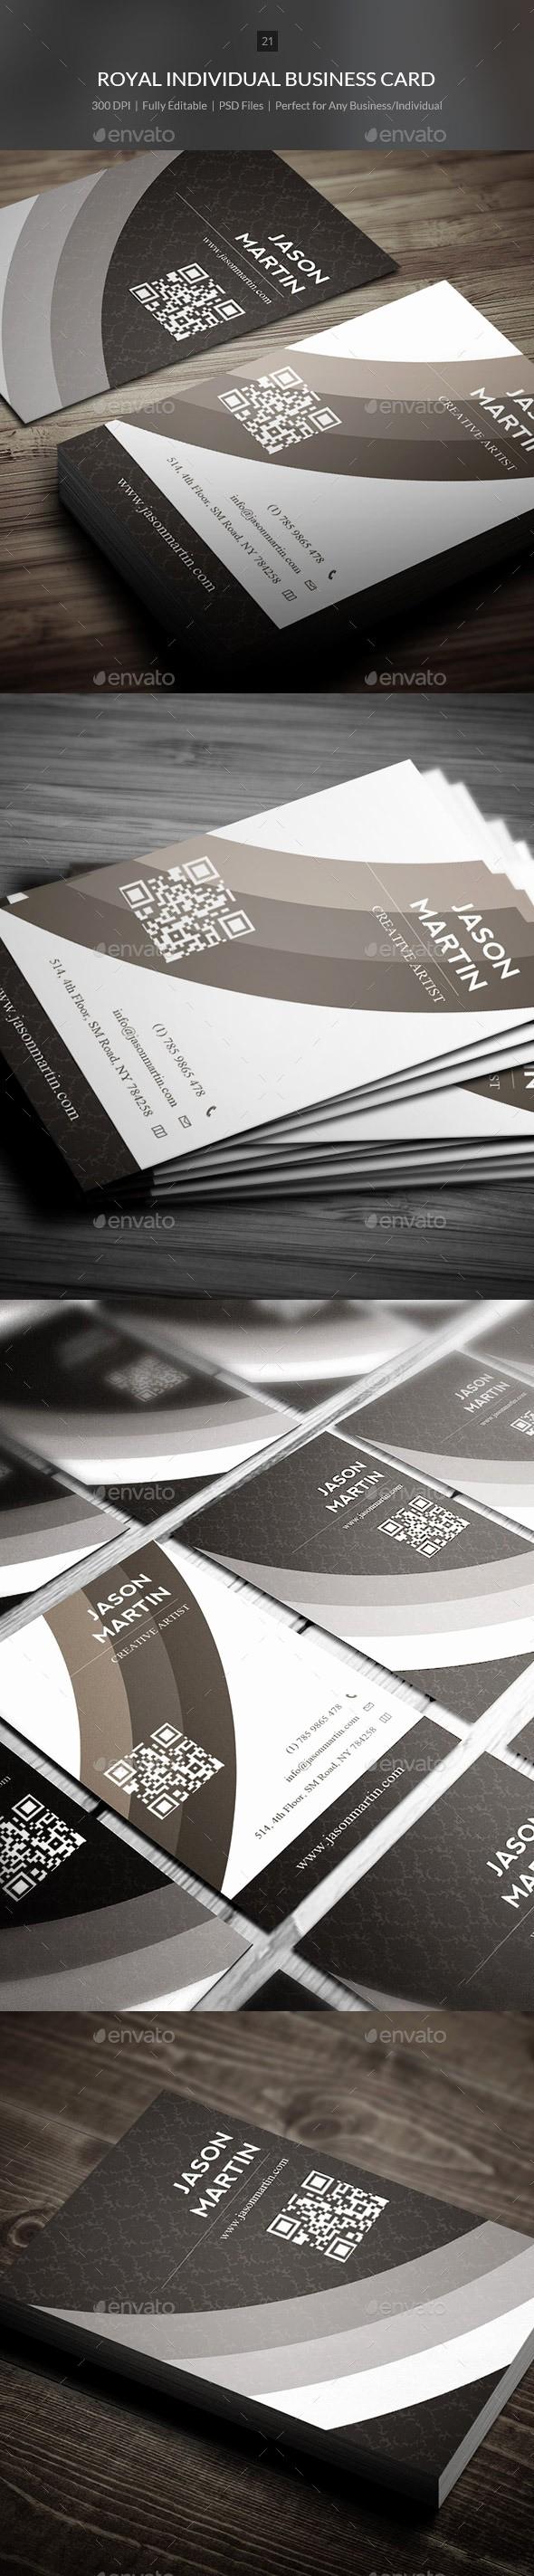 Royal Brites Business Card Template Elegant Template for Royal Brites Business Cards 21 6 Cm X 27 9 Cm